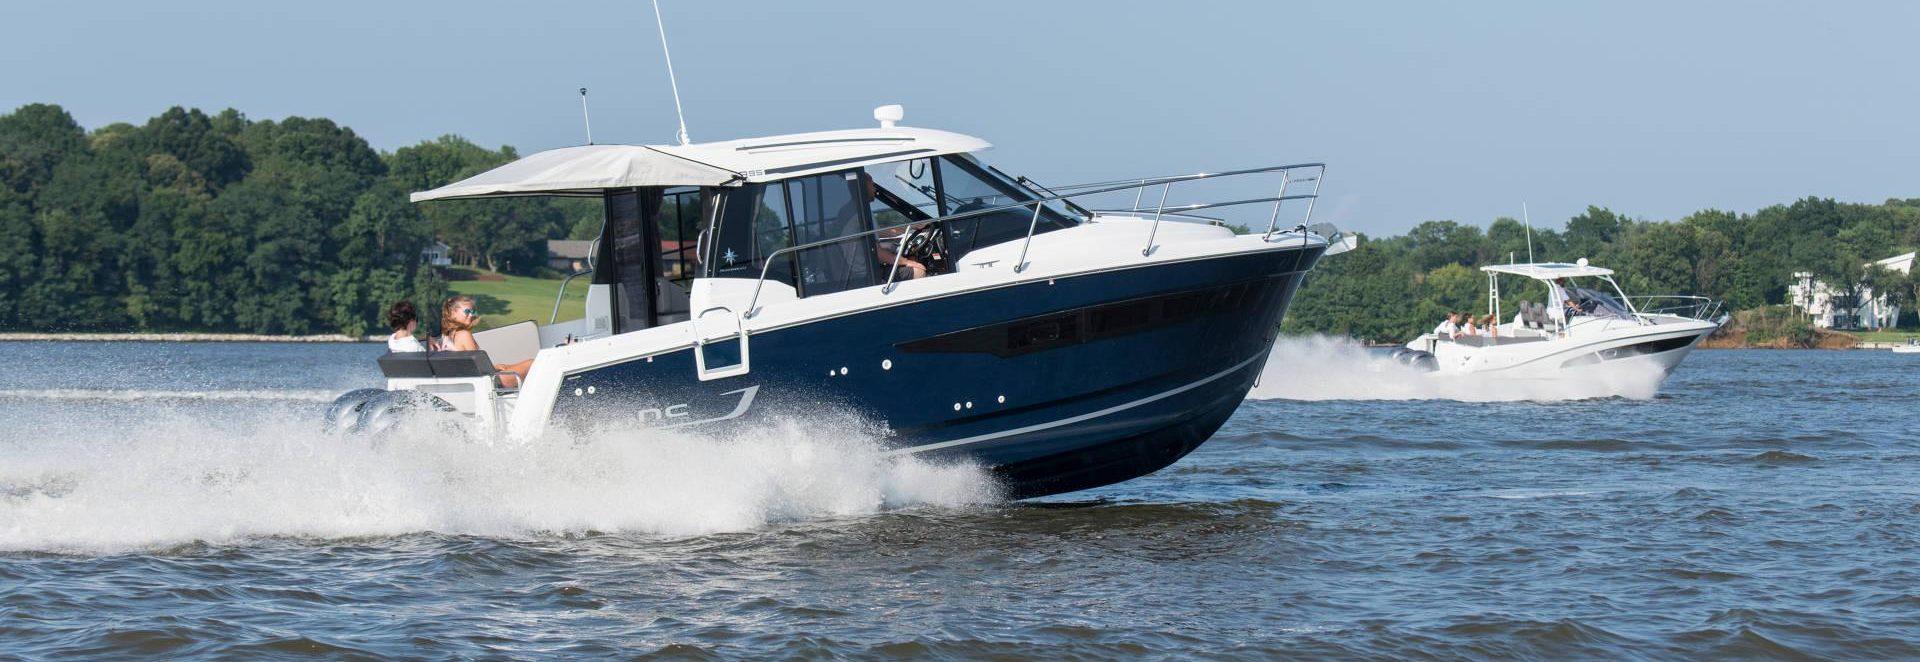 jeanneau outboard NC 895 cruising